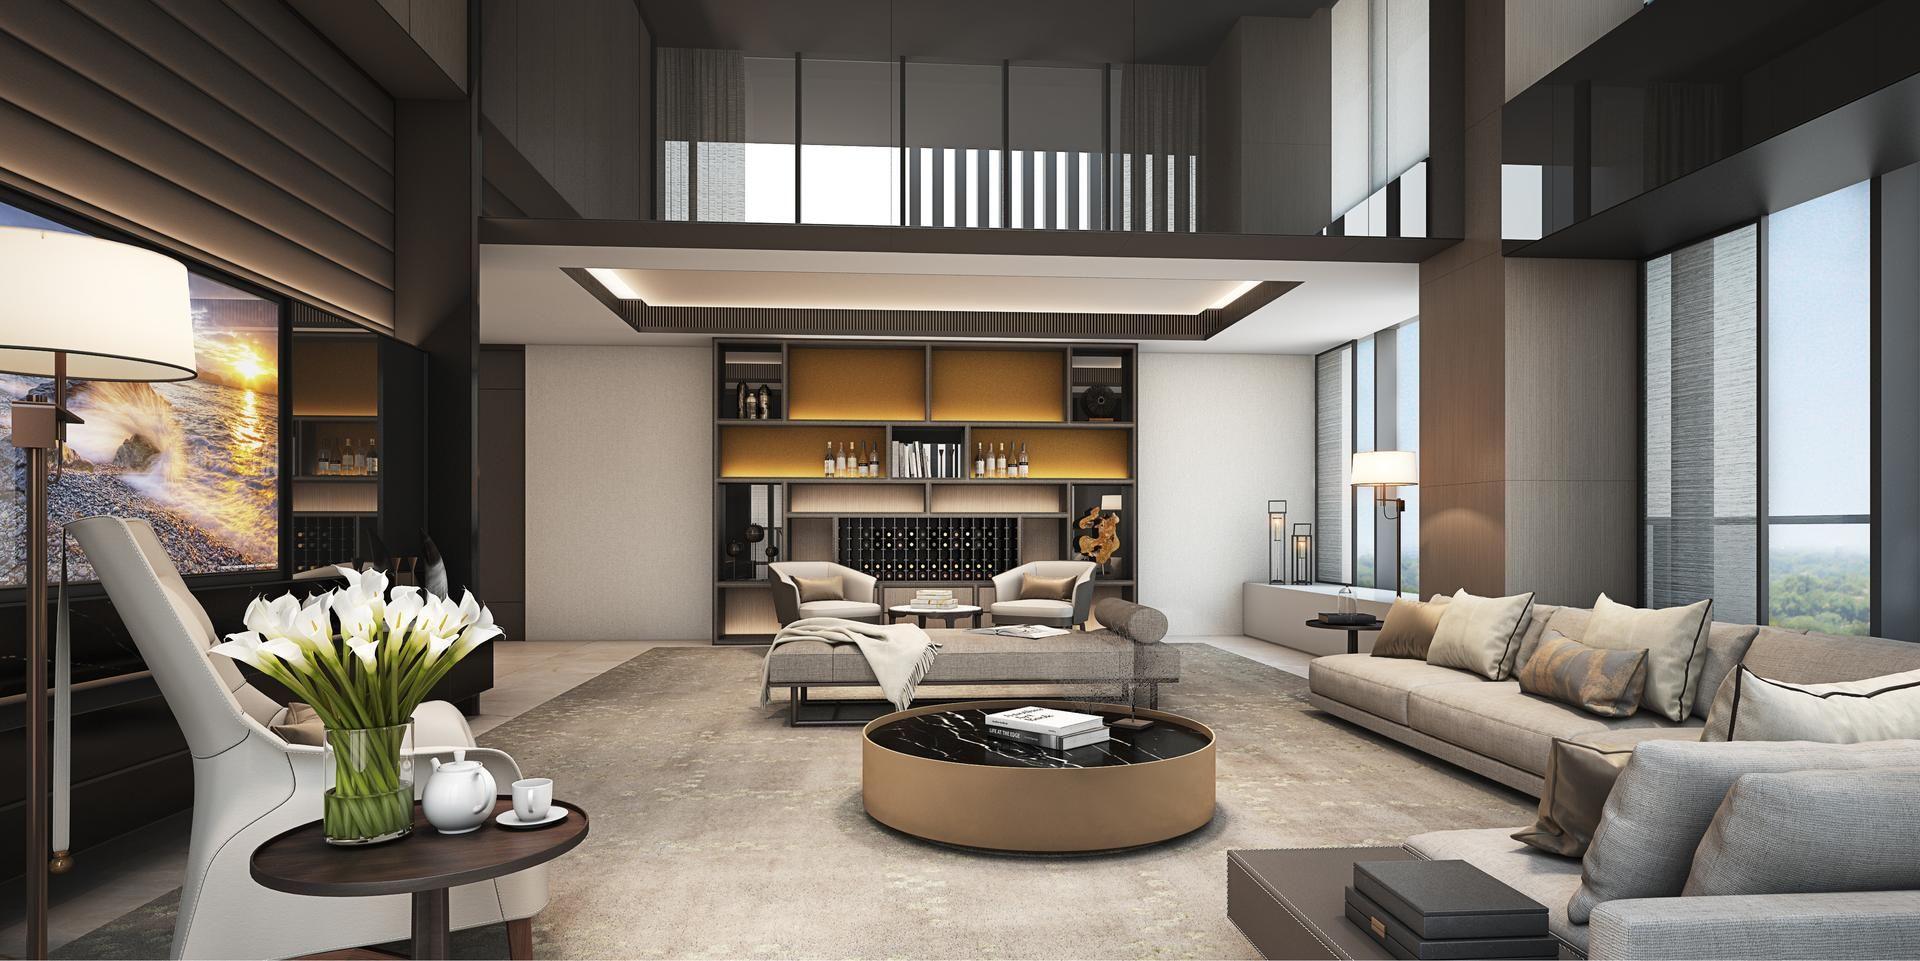 http://www.scdaarchitects.com/interiors/oct-tian-er-hu | SCDA ...